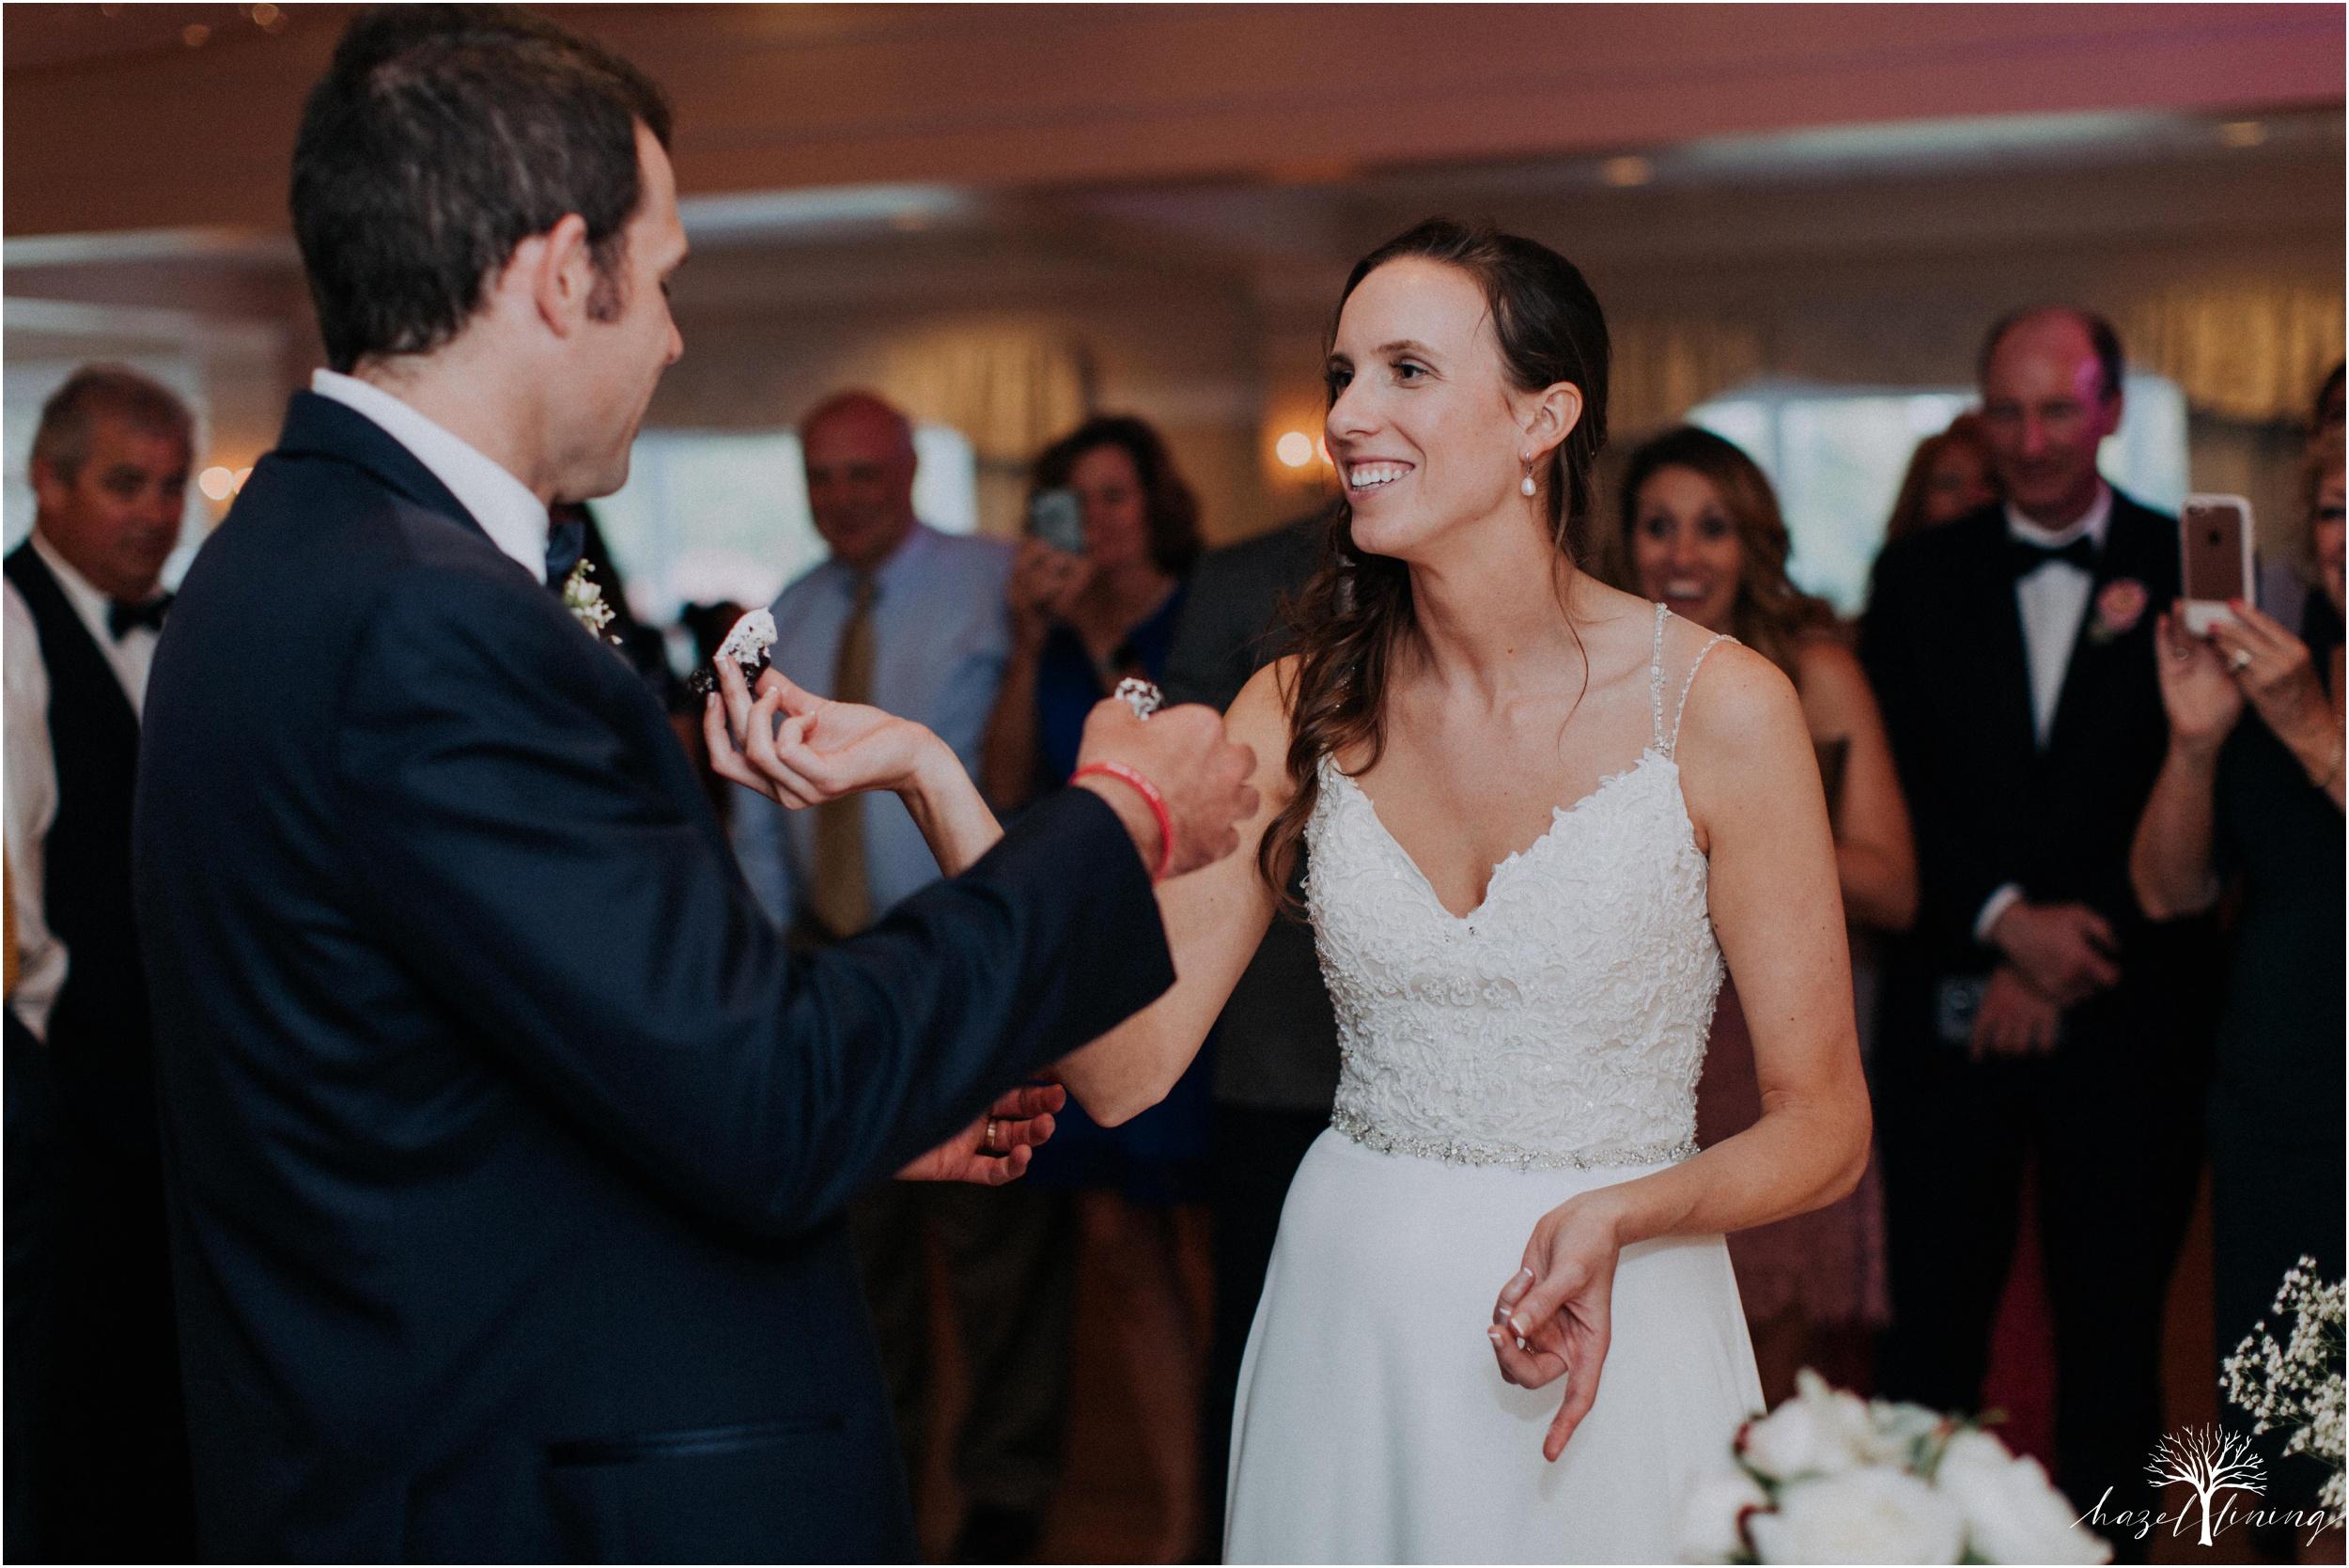 hazel-lining-travel-wedding-elopement-photography_0149.jpg